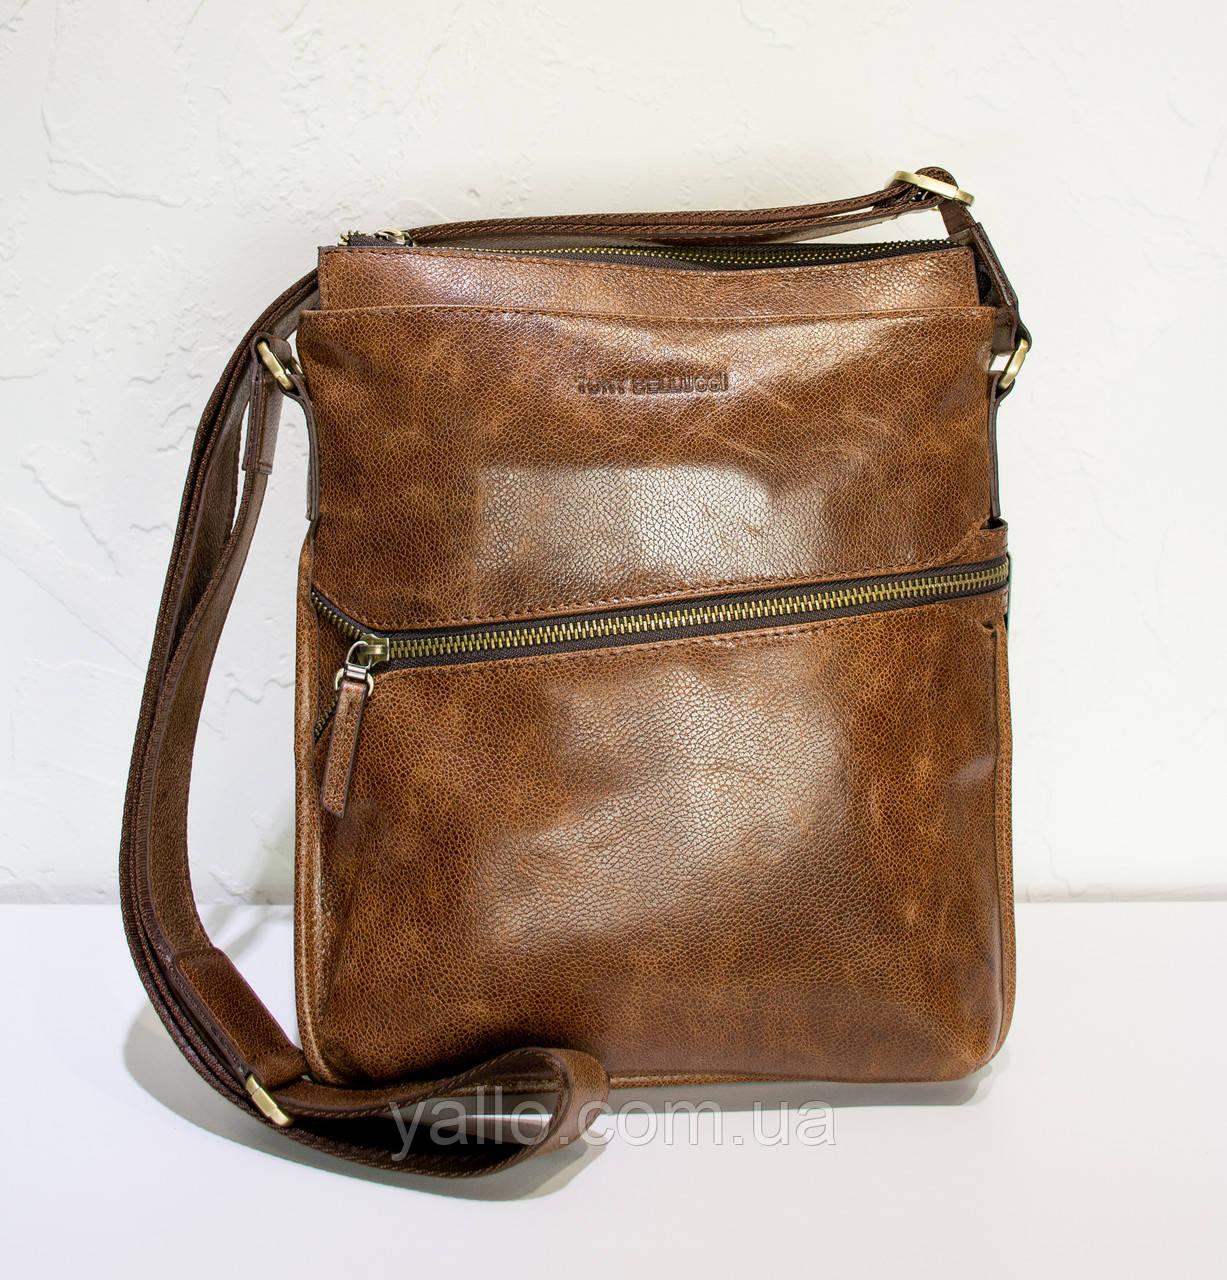 Натуральная кожаная сумка для мужчин Tony Bellucci T5029-